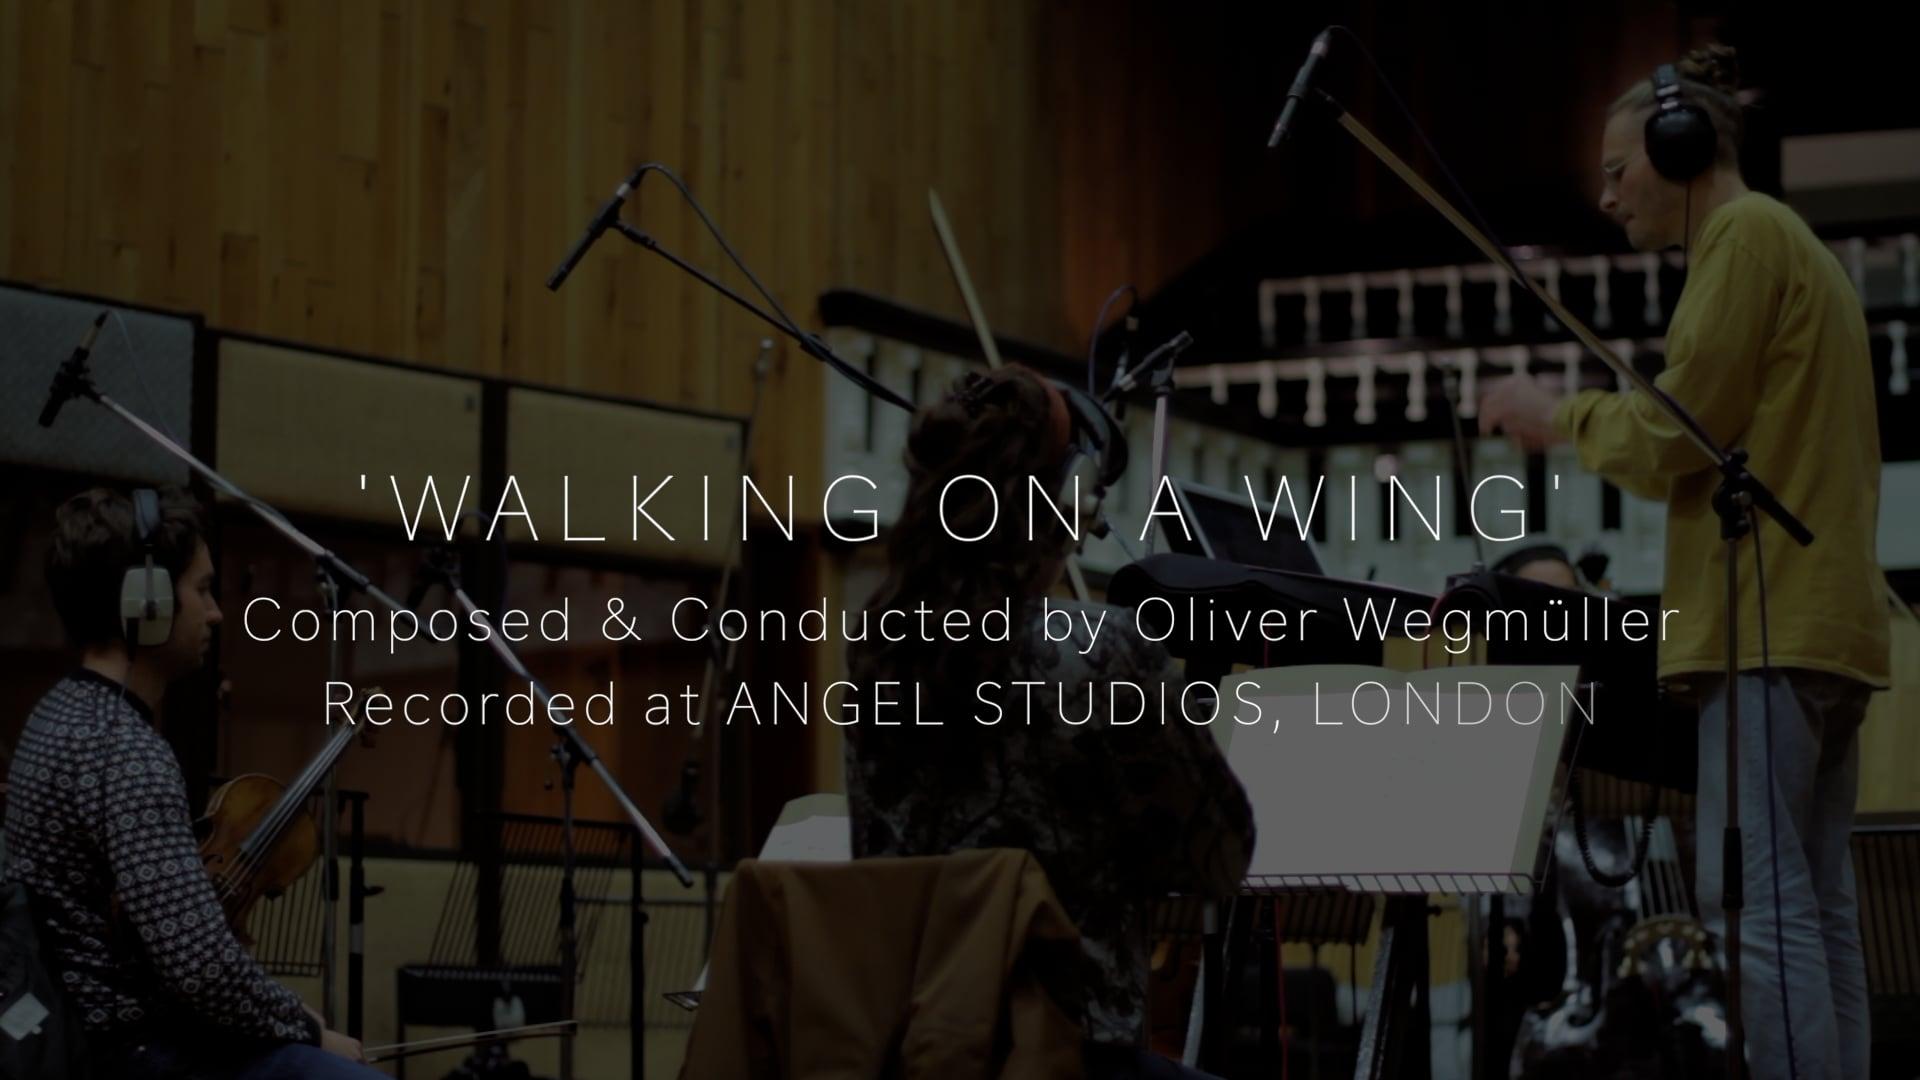 Walking On A Wing - Oliver Wegmüller @ Angel Studios